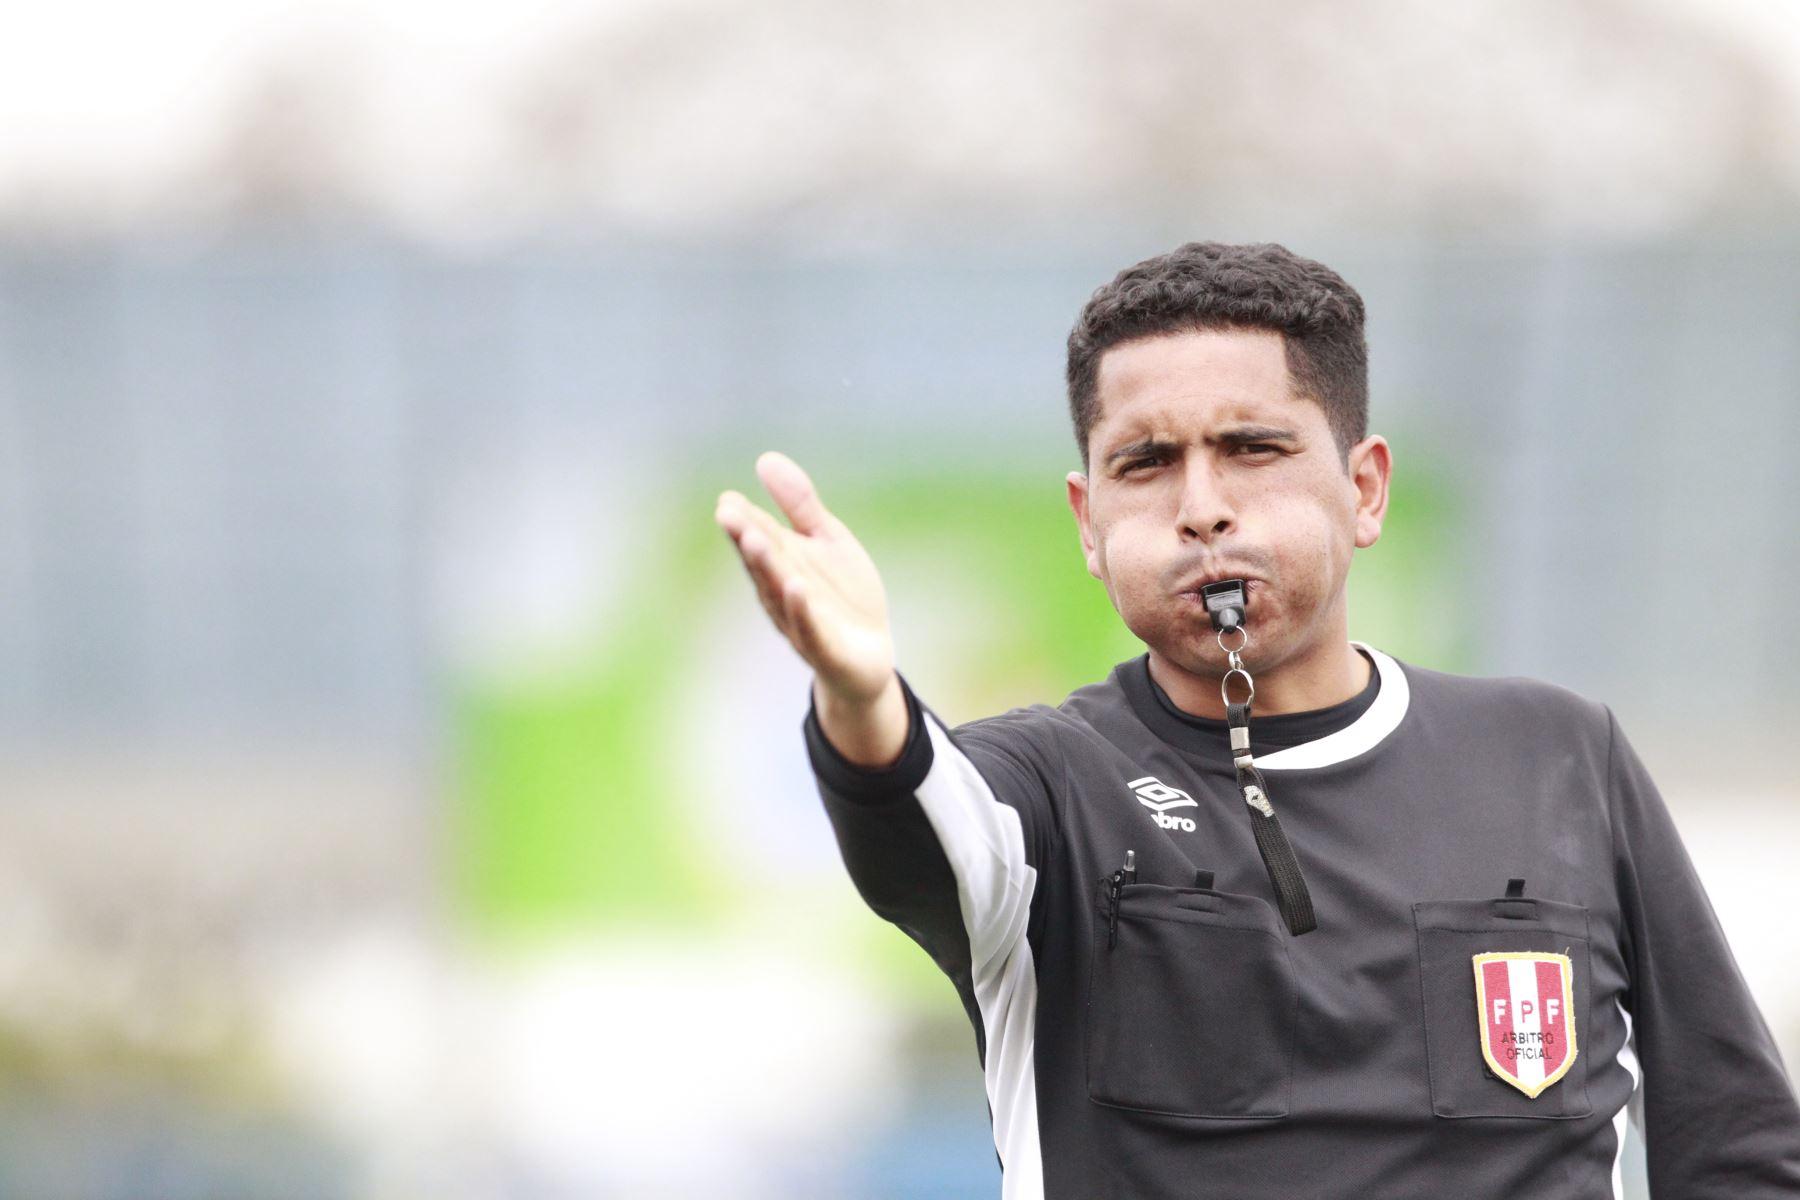 Gian Carlo Marcoz Rossi, árbitro de fútbol  Foto: ANDINA / Juan Carlos Guzmán Negrini.